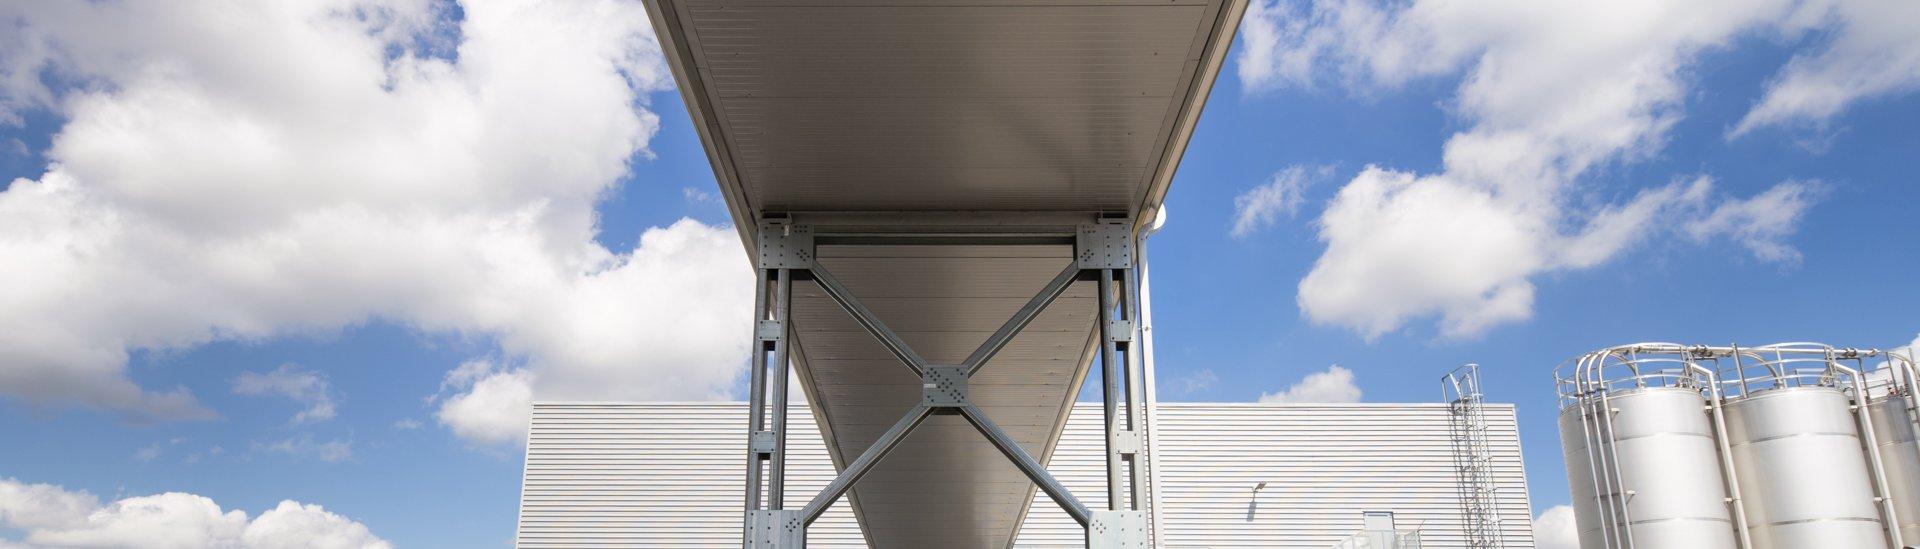 Steel buildings technical information, CZ0741 Rimowa bridge